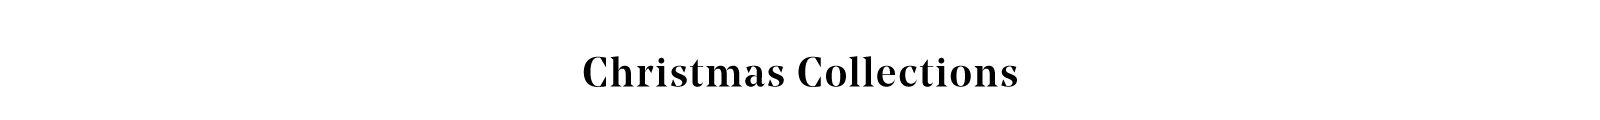 XMAS 18 L'Oreal Xmas Feature Title